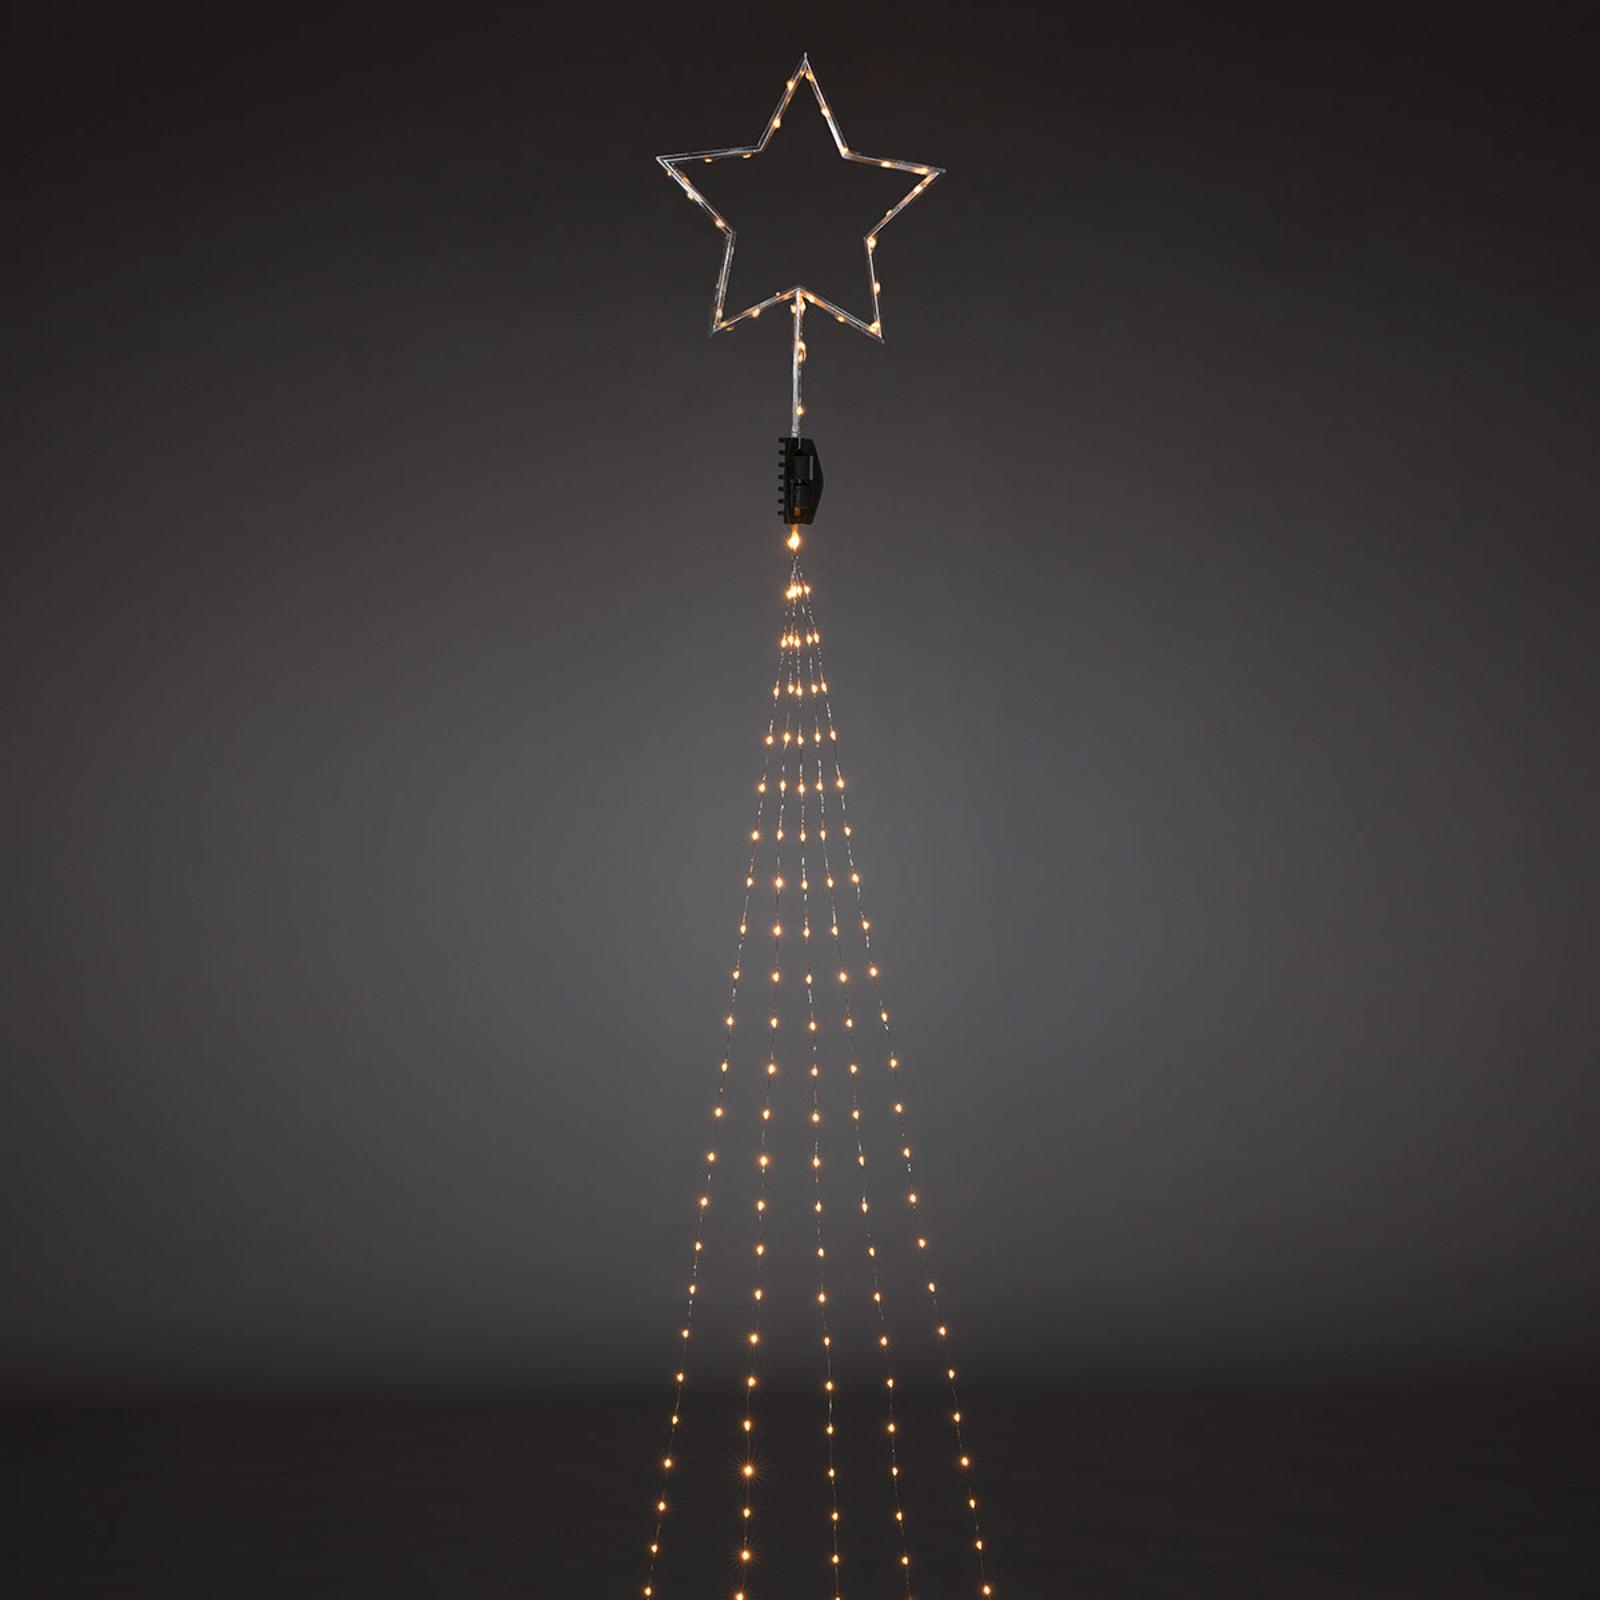 Top-Stern in Silber - LED-Baummantel 274-flg.